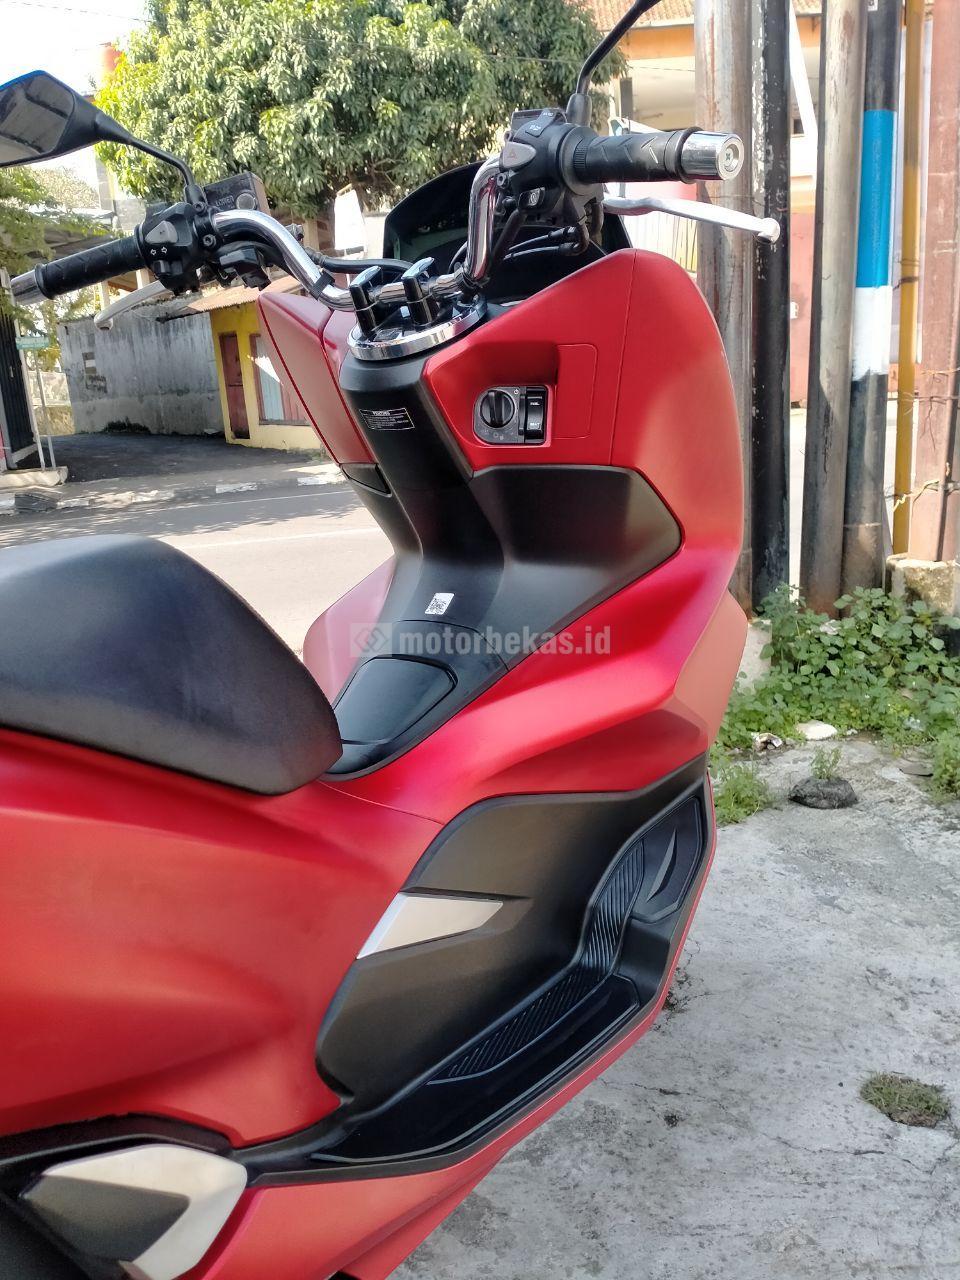 HONDA PCX  3016 motorbekas.id